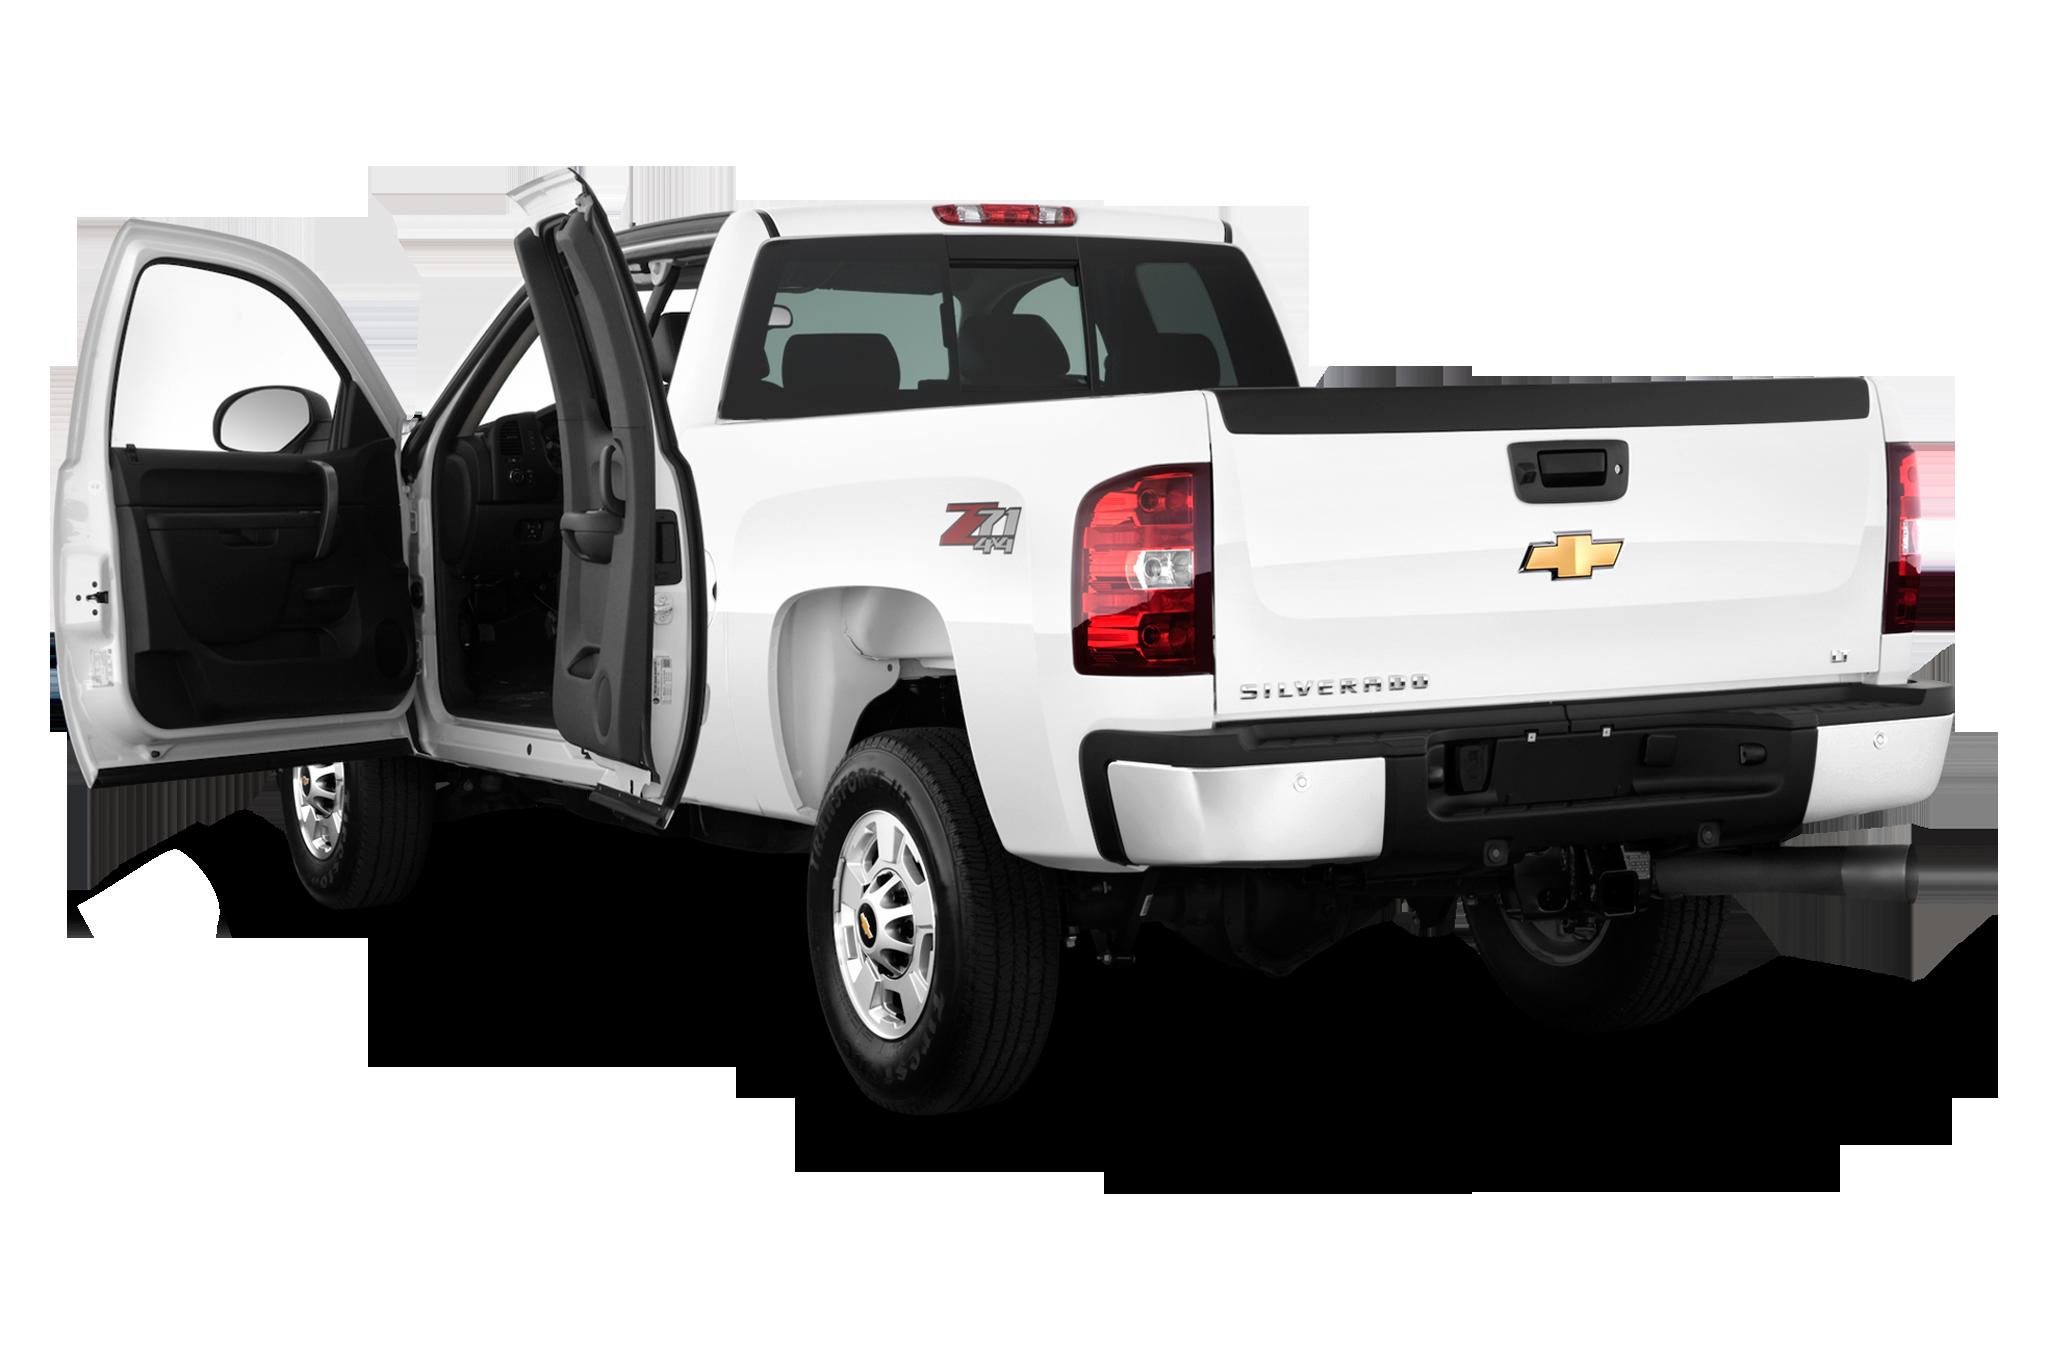 torque monster first 2011 chevrolet silverado heavy duty pickup truck rolls off. Black Bedroom Furniture Sets. Home Design Ideas